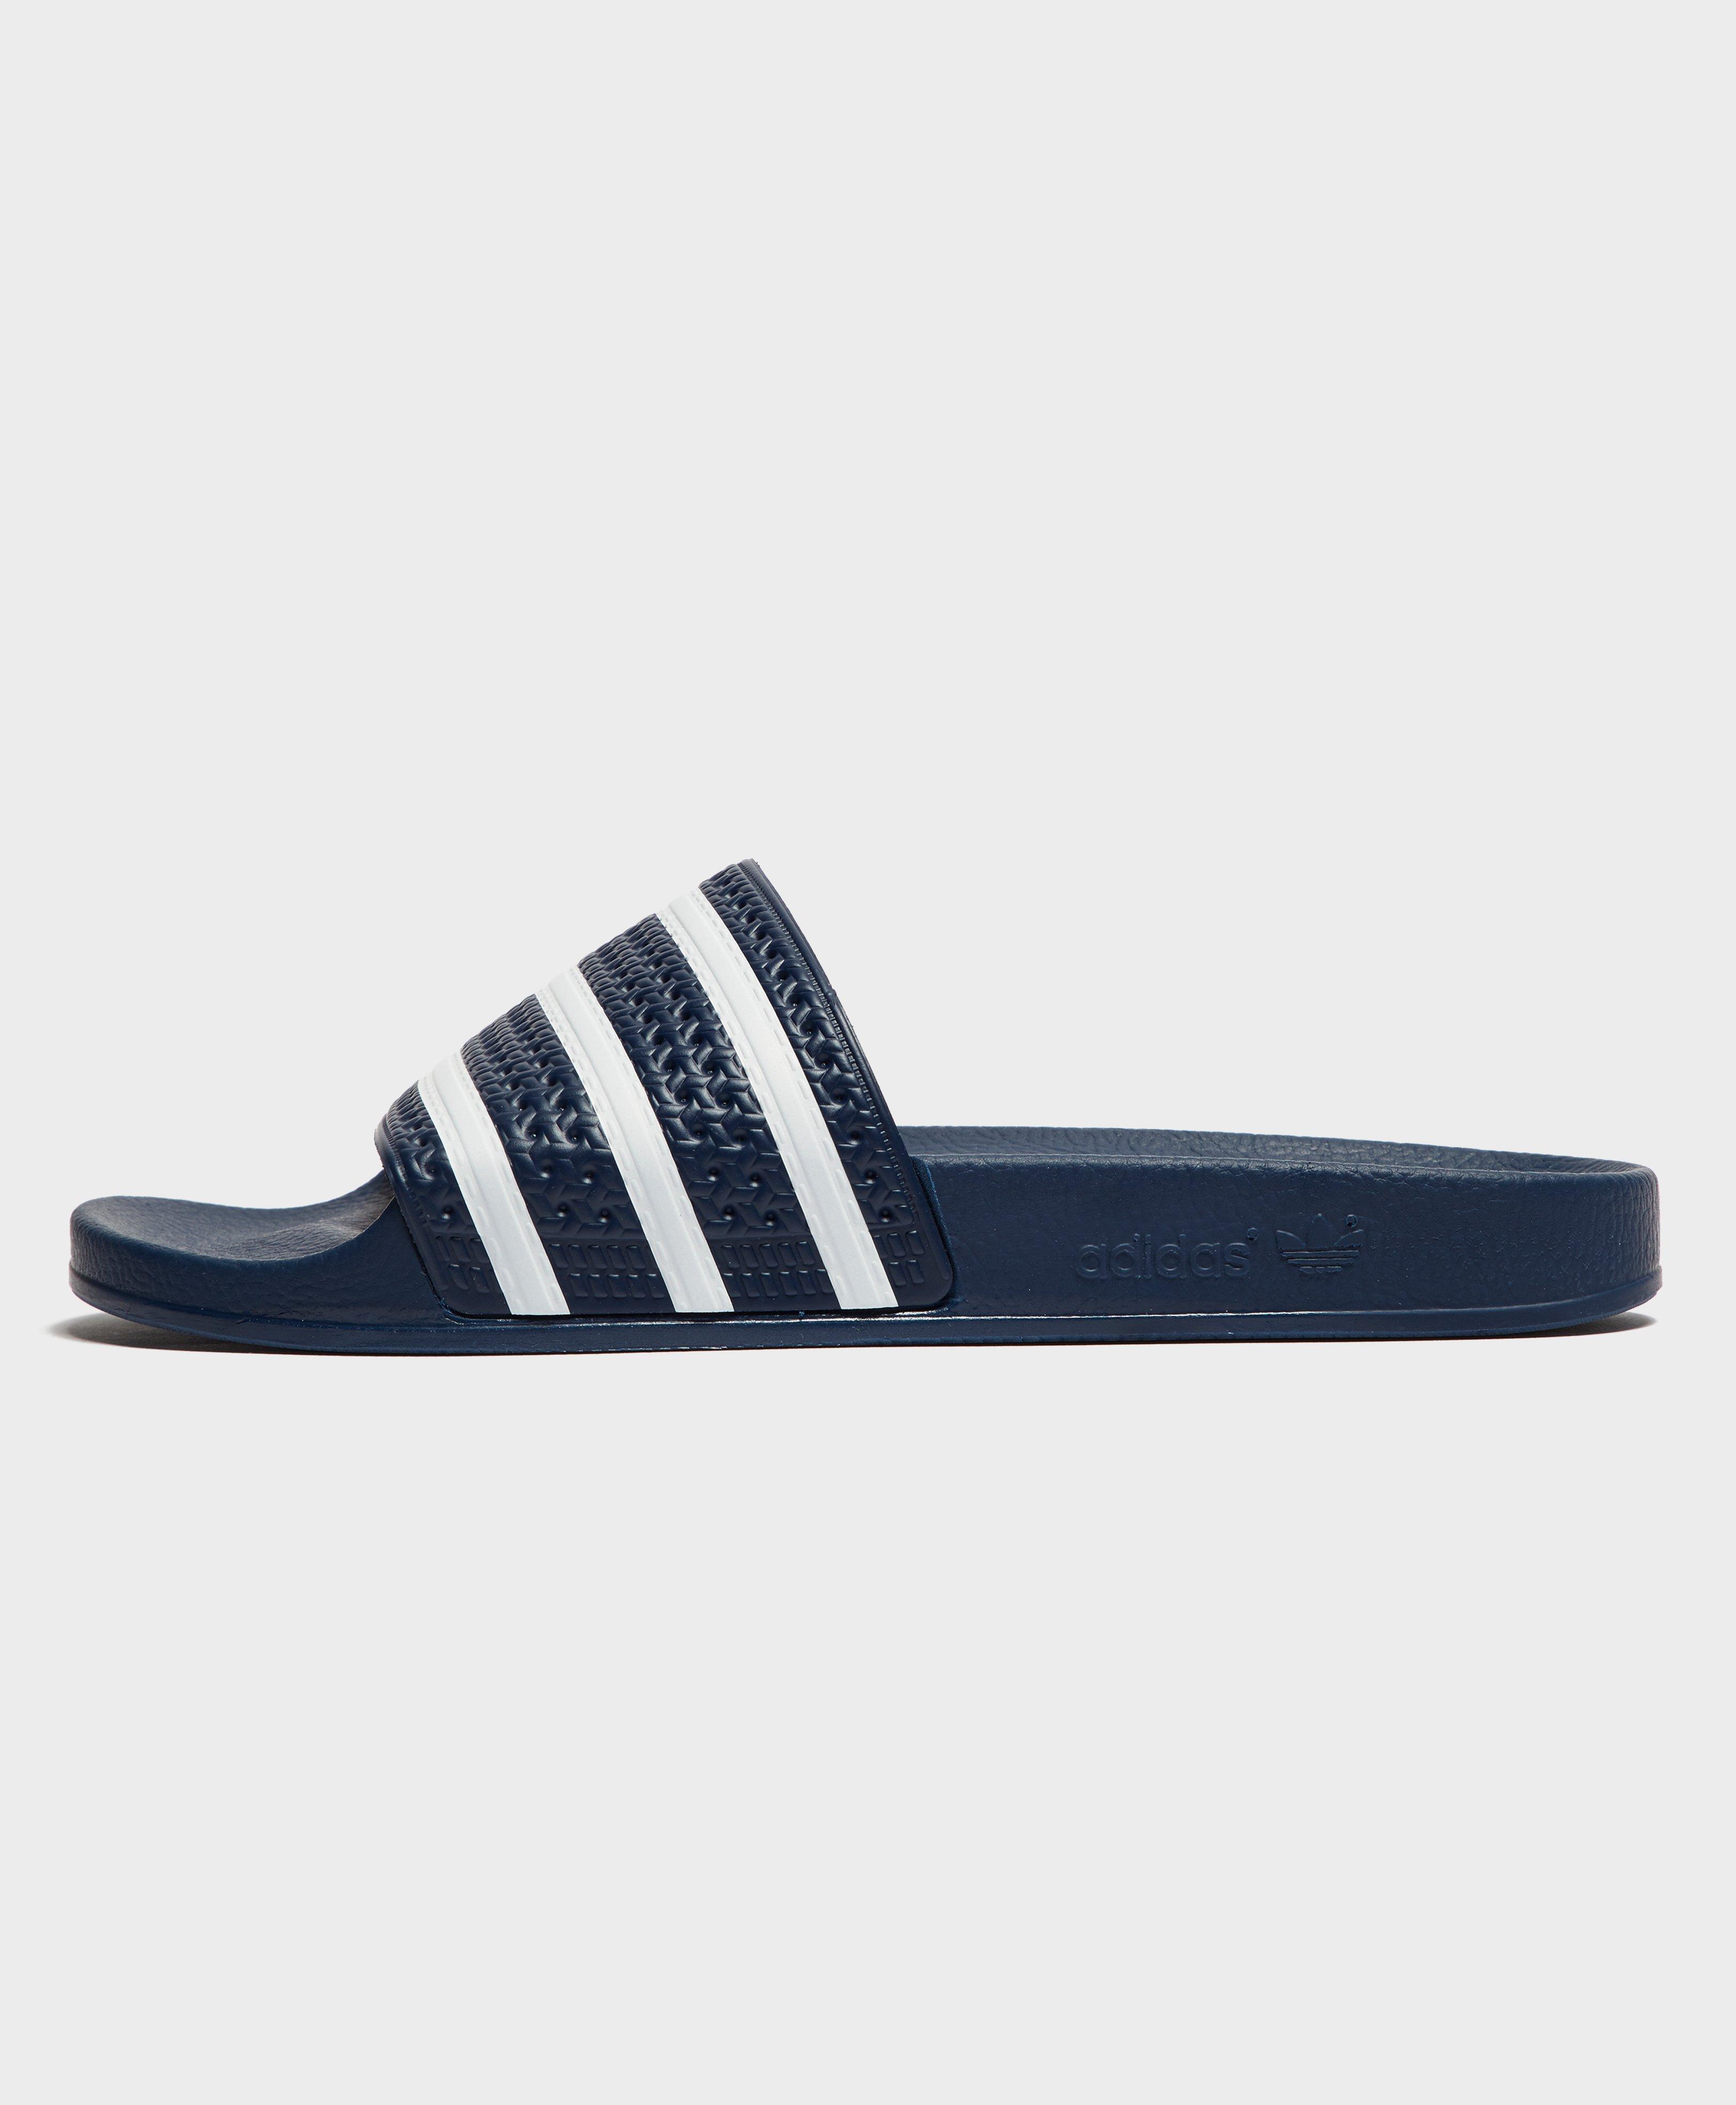 huge selection of 36b64 0d5d1 Adidas Originals - Blue Adilette Slides for Men - Lyst. View fullscreen